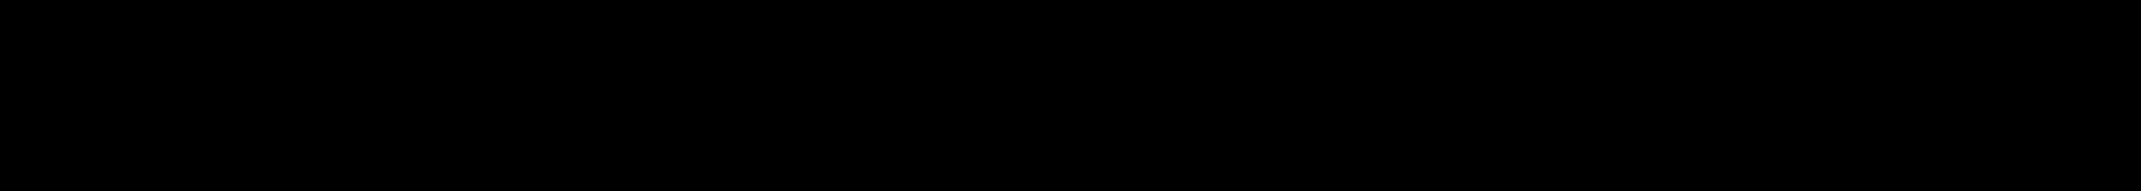 Museo Sans Cyrillic 300